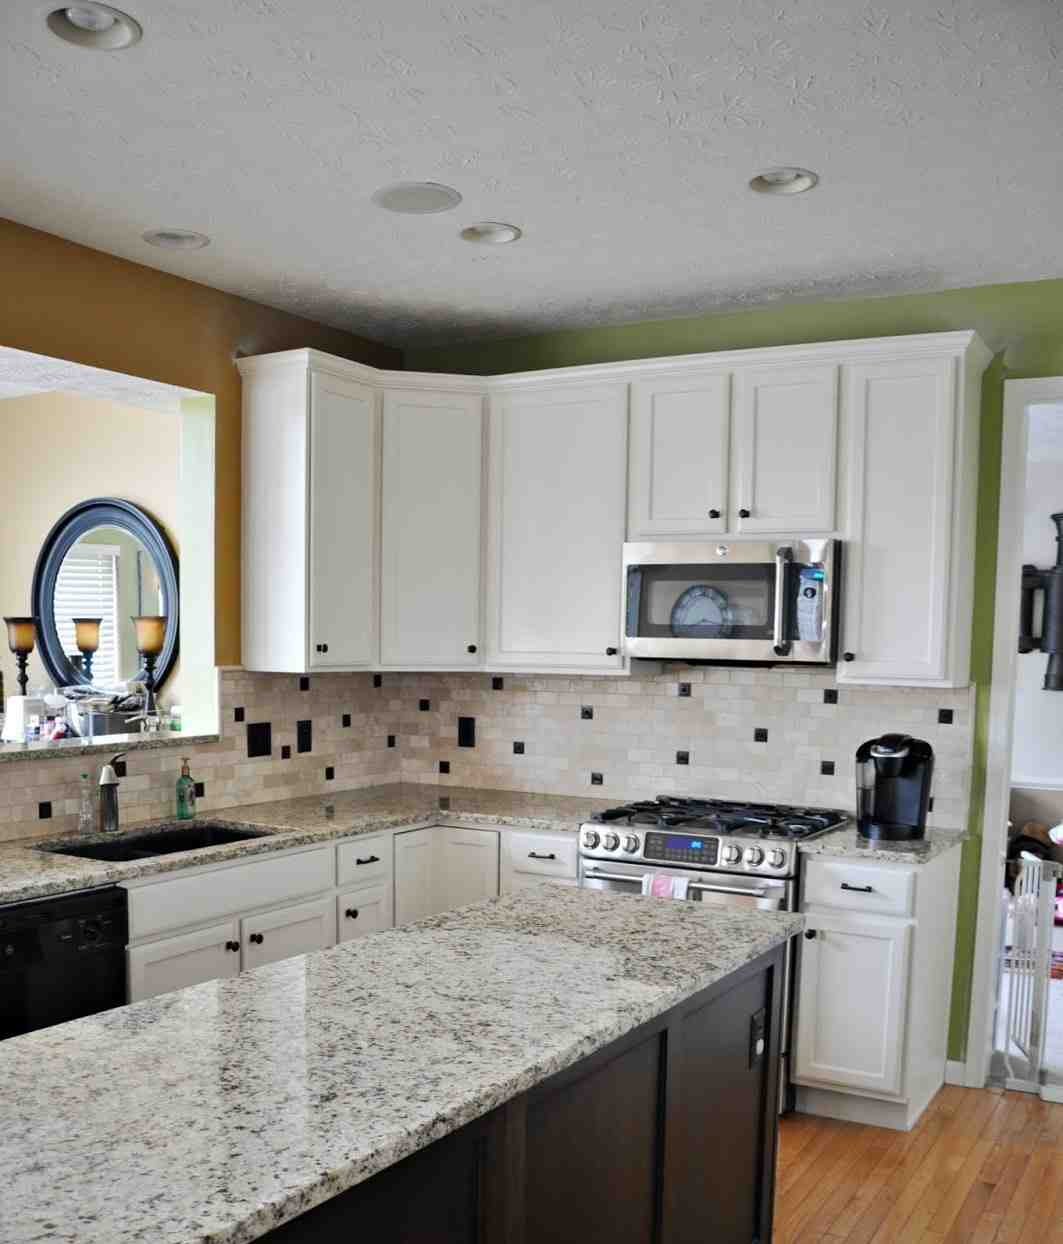 Ideas For Redoing Kitchen Cupboards: Oak Kitchen Cabinet Makeover